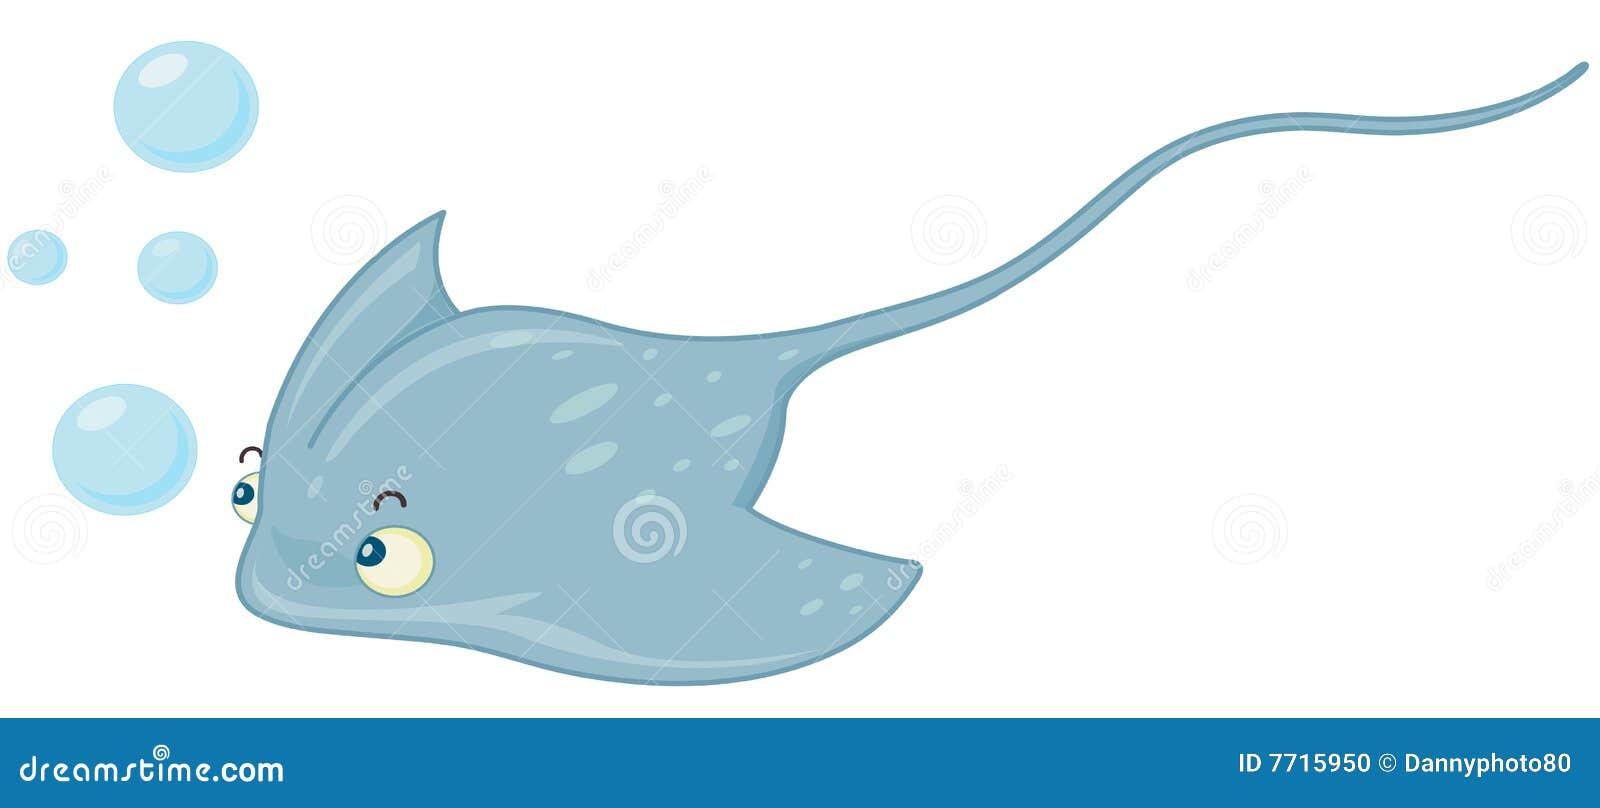 Illustratiion of blue stingray swimming.